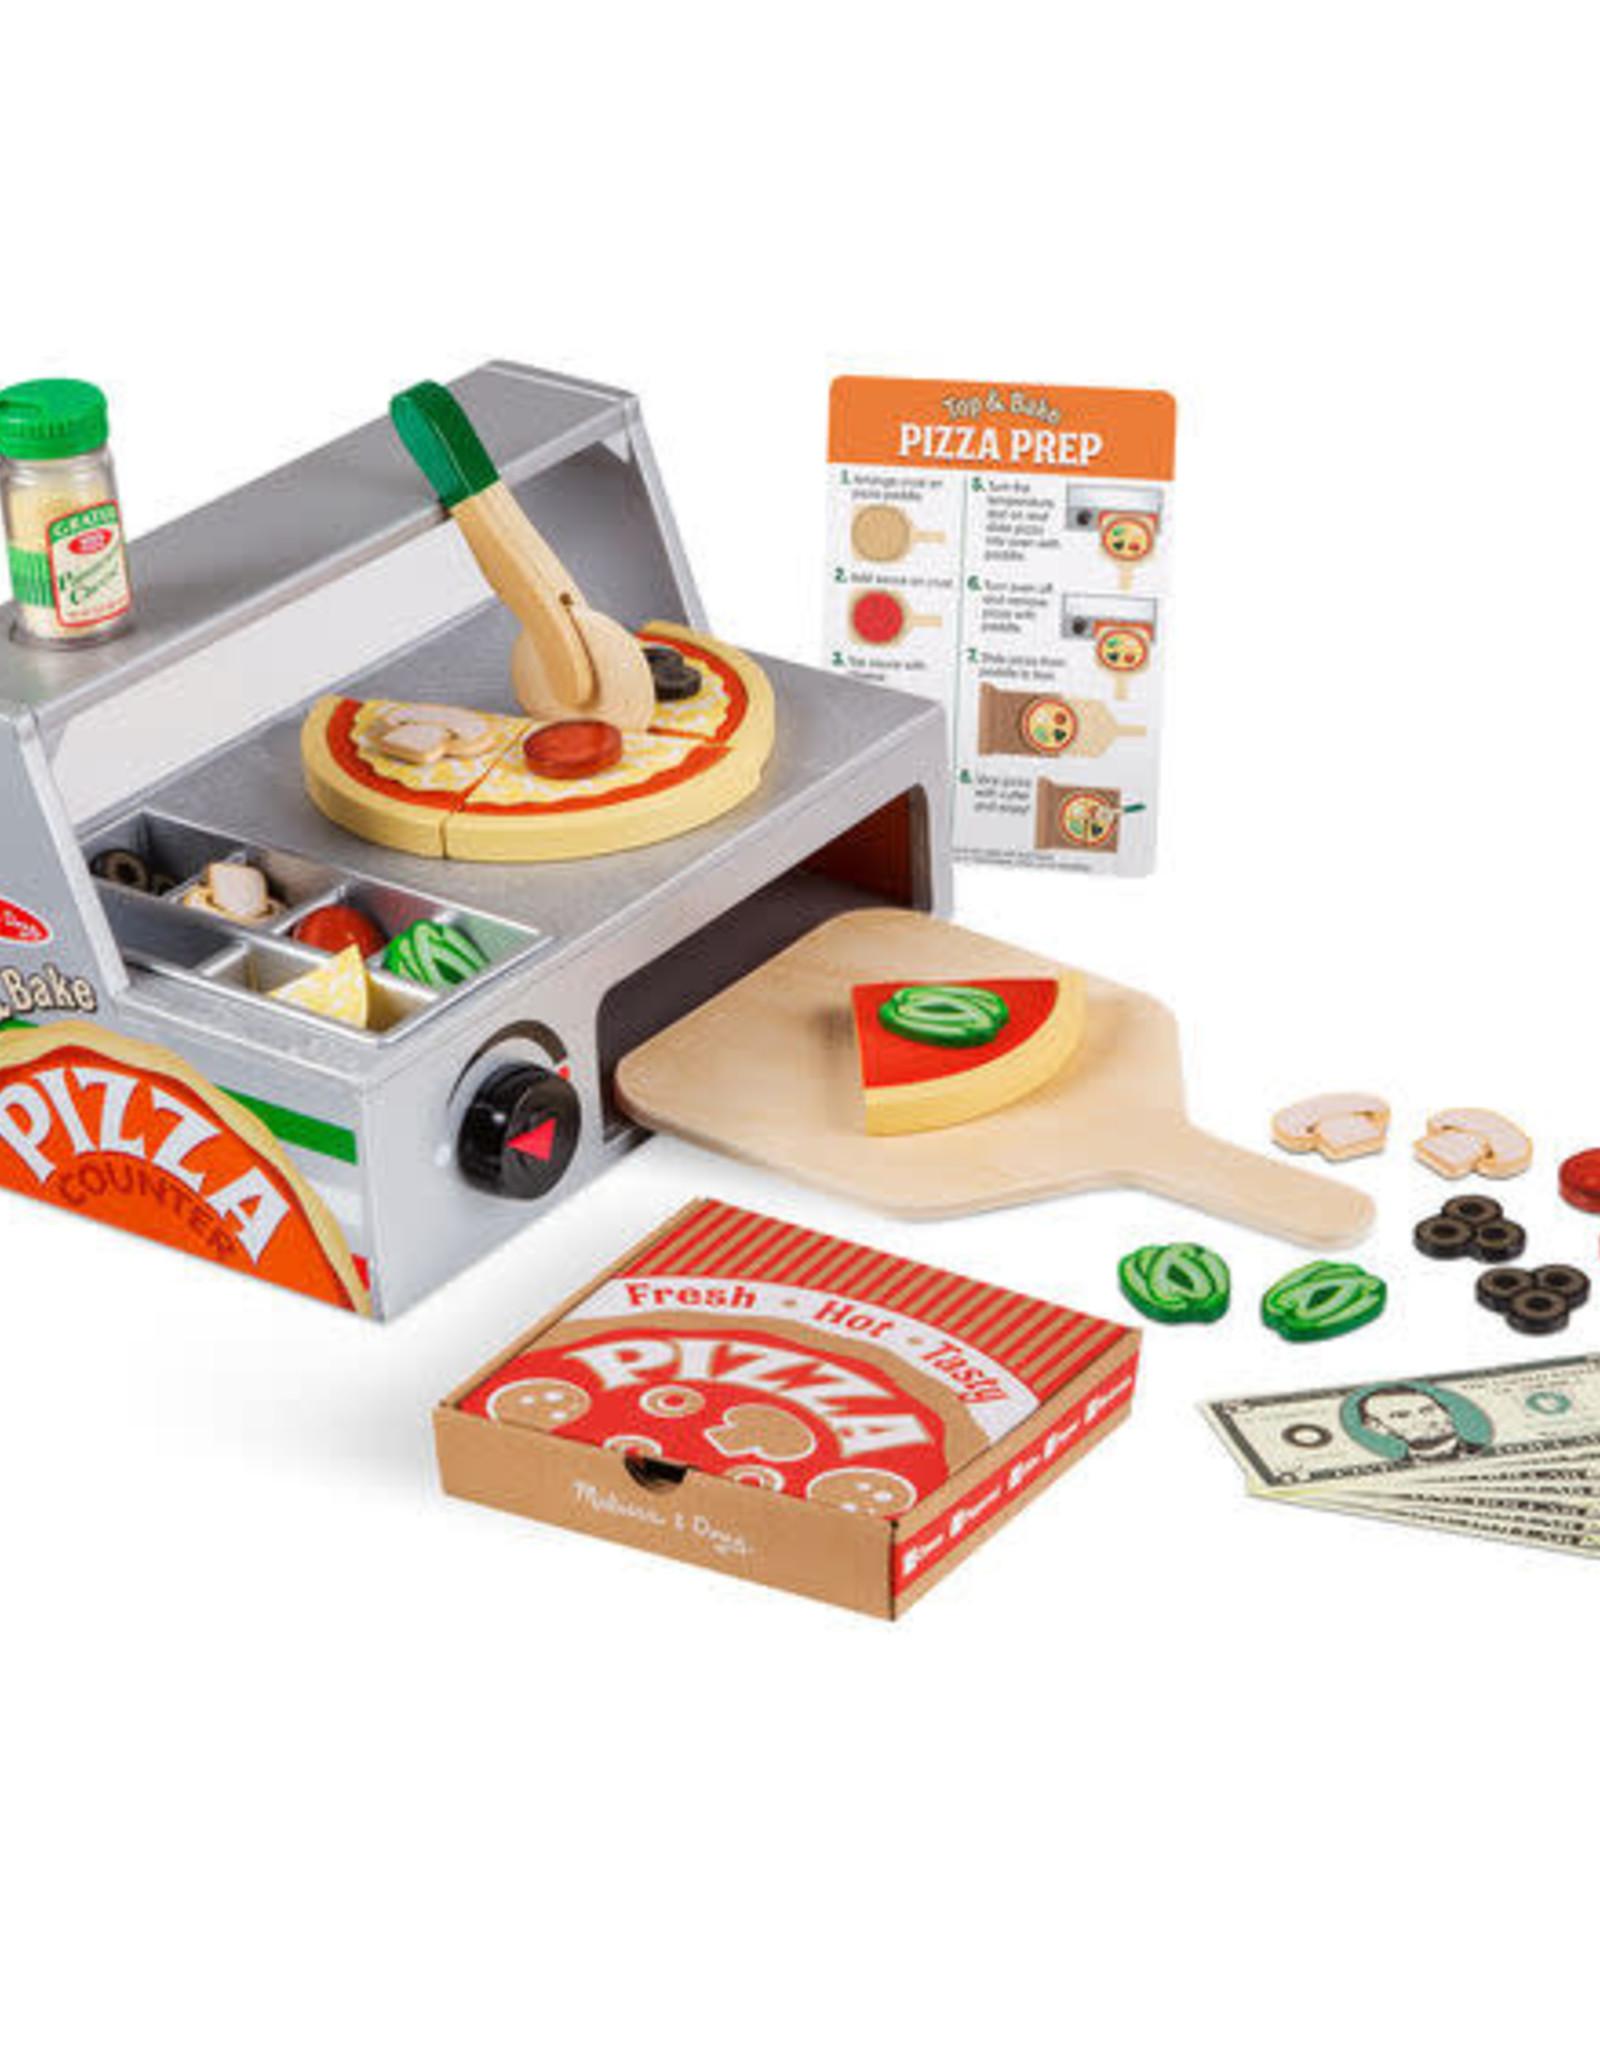 Melissa & Doug Melissa & Doug Top & Bake Pizza Counter Play Set